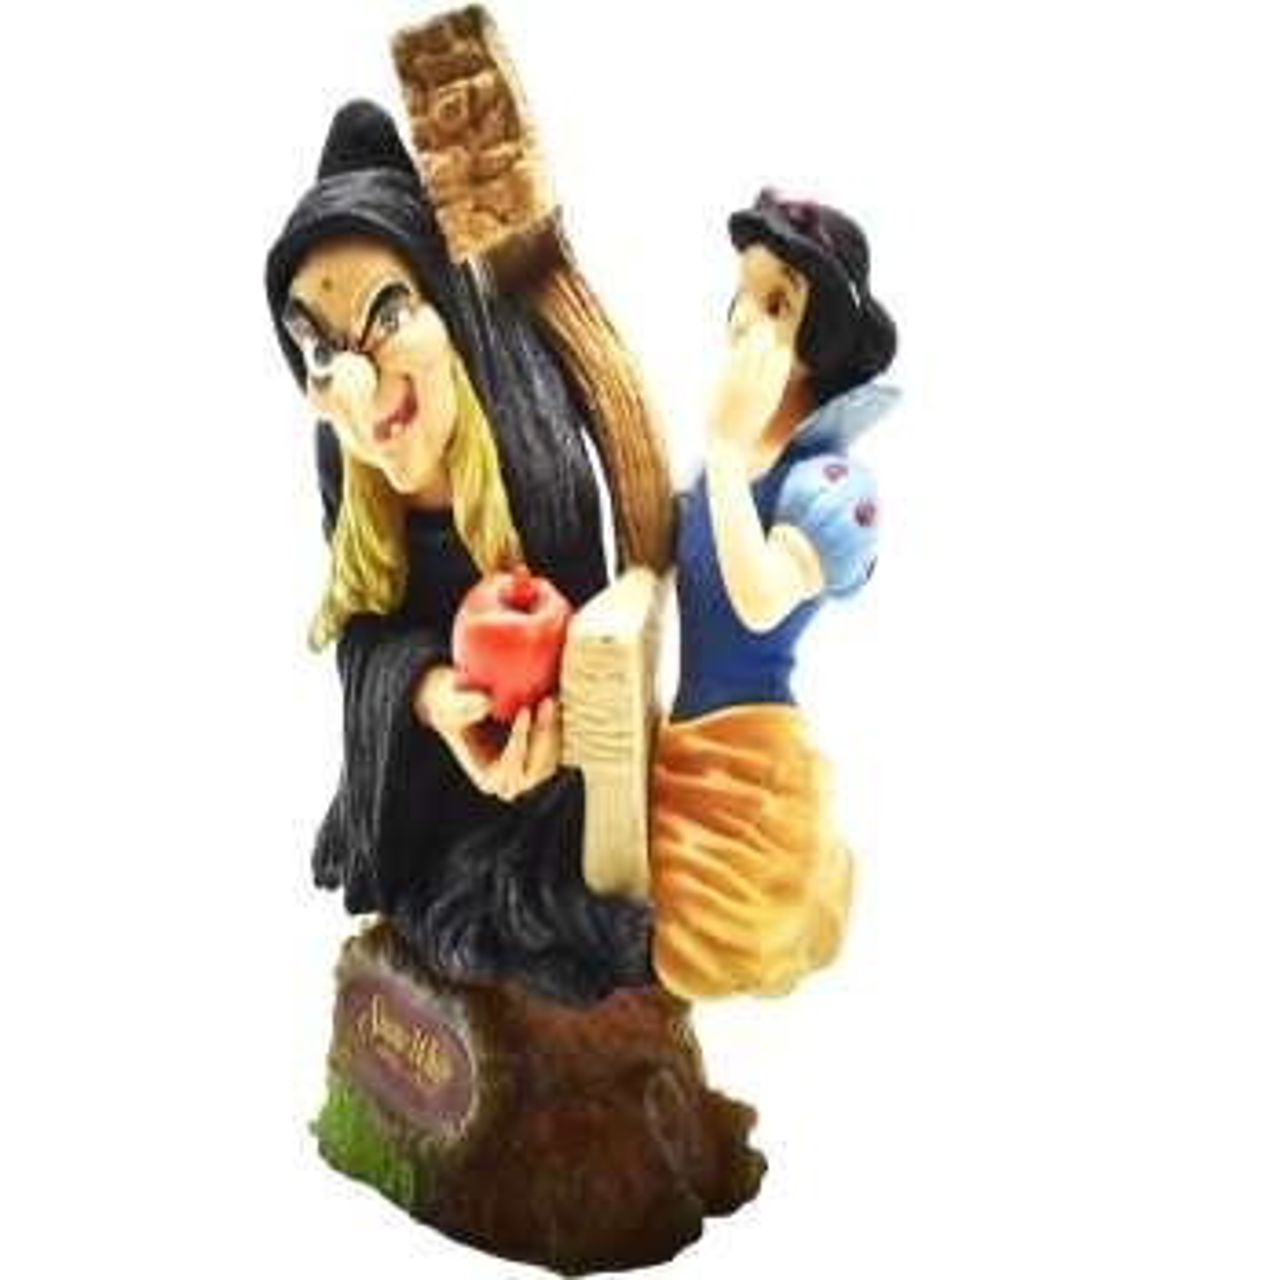 مجسمه آکو مدل Snow white کد 905203